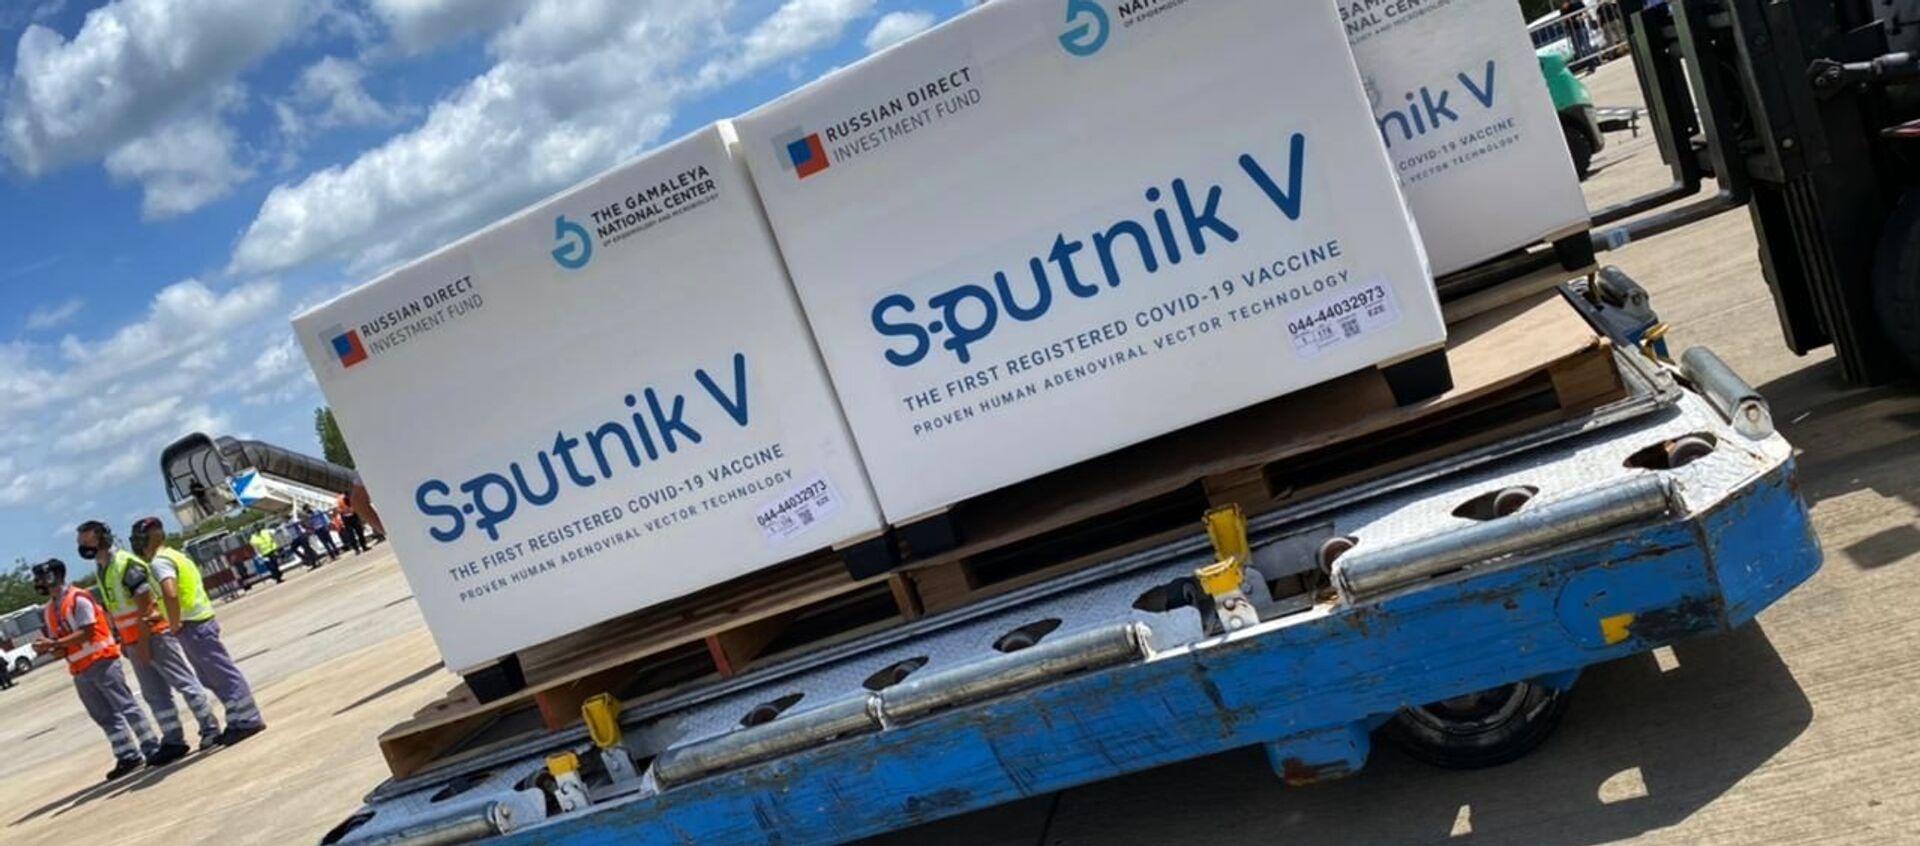 "Rosyjska szczepionka ""Sputnik V"" na lotnisku w Buenos Aires - Sputnik Polska, 1920, 20.02.2021"